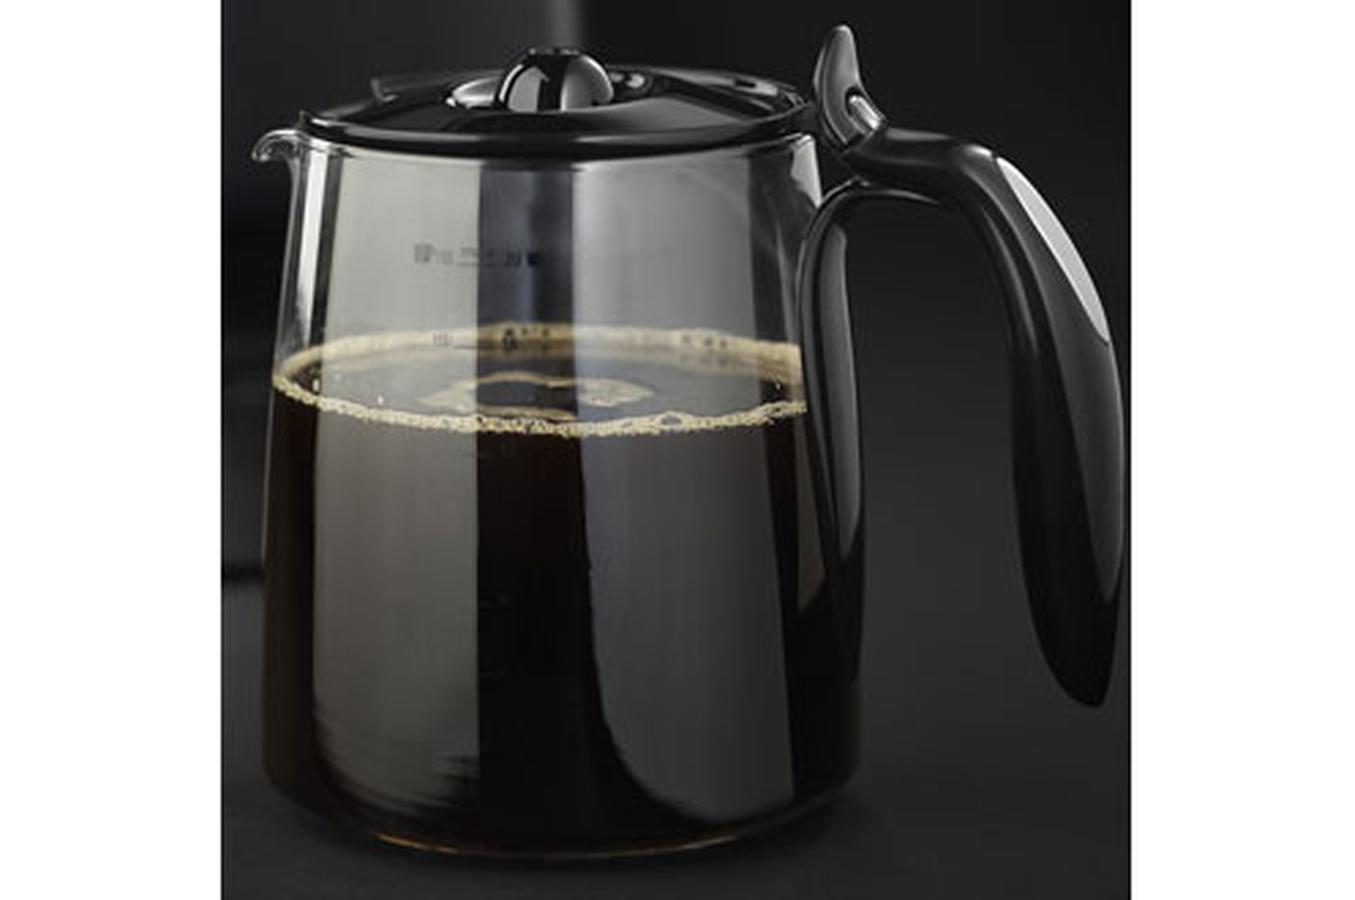 cafeti re filtre russell hobbs 15074 56 stylis noir. Black Bedroom Furniture Sets. Home Design Ideas